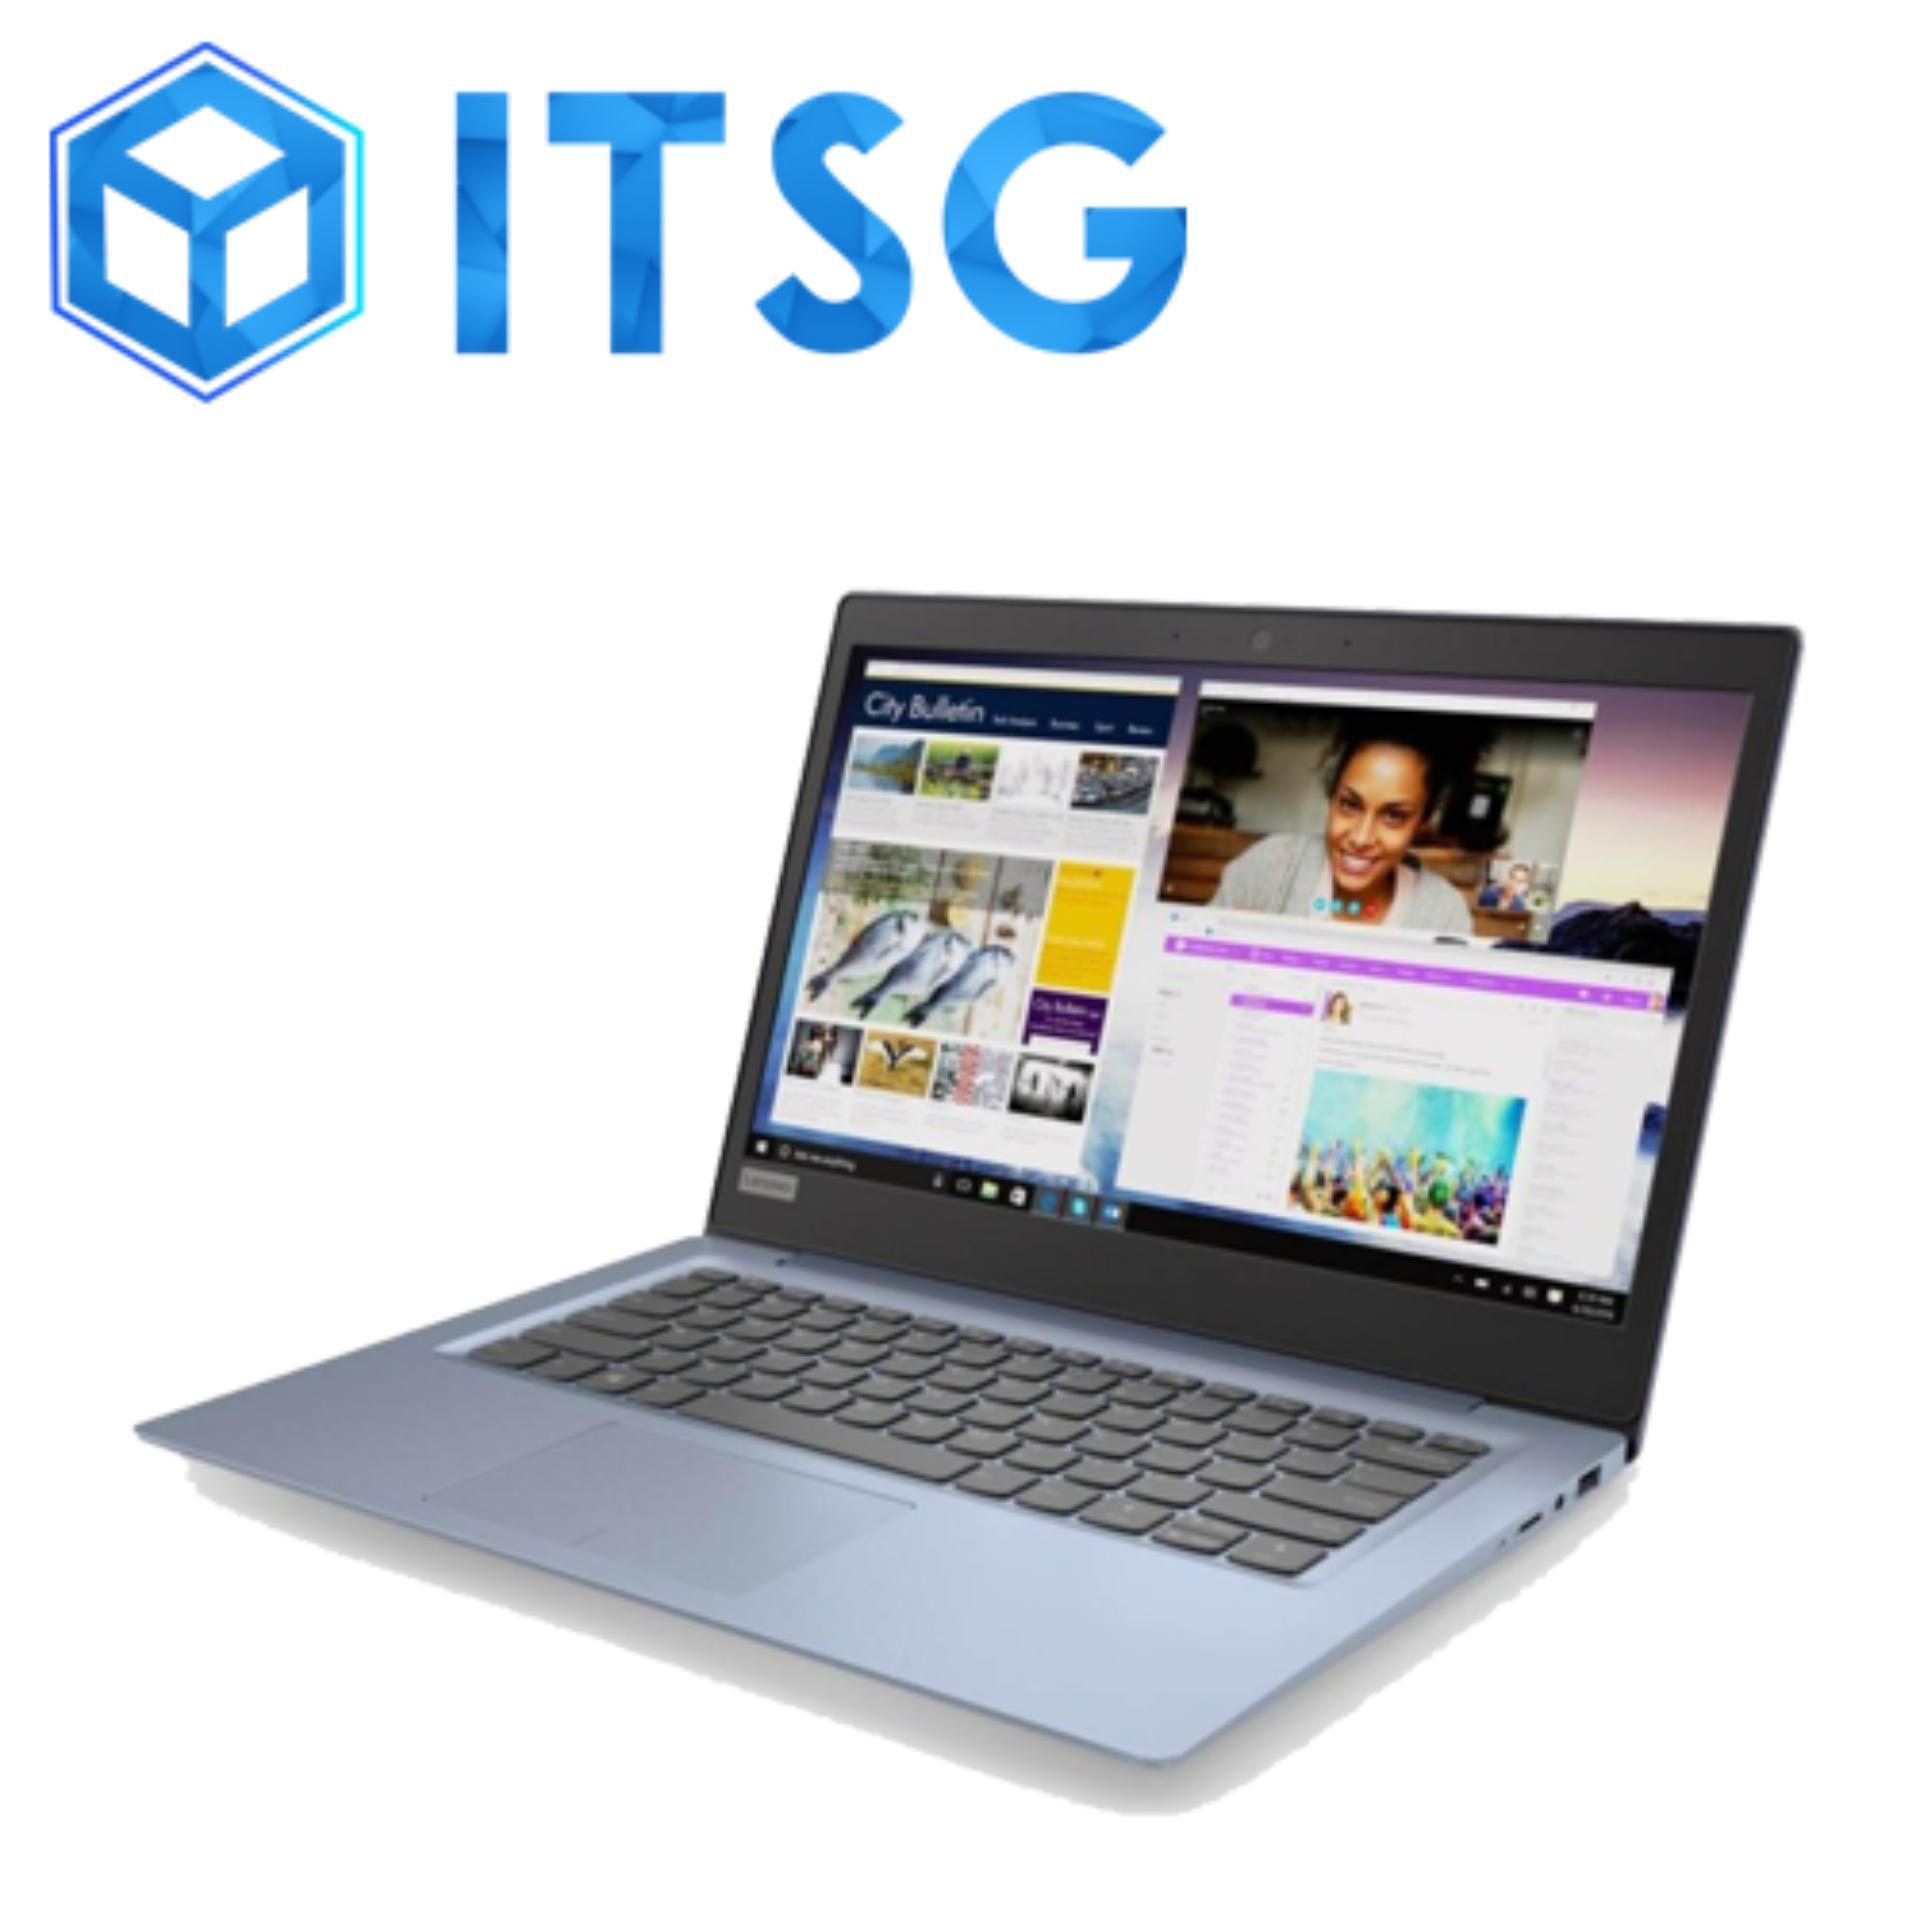 Lenovo IdeaPad 120S-14IAP (Denim Blue) / Laptop / Notebook / Workstation / 14